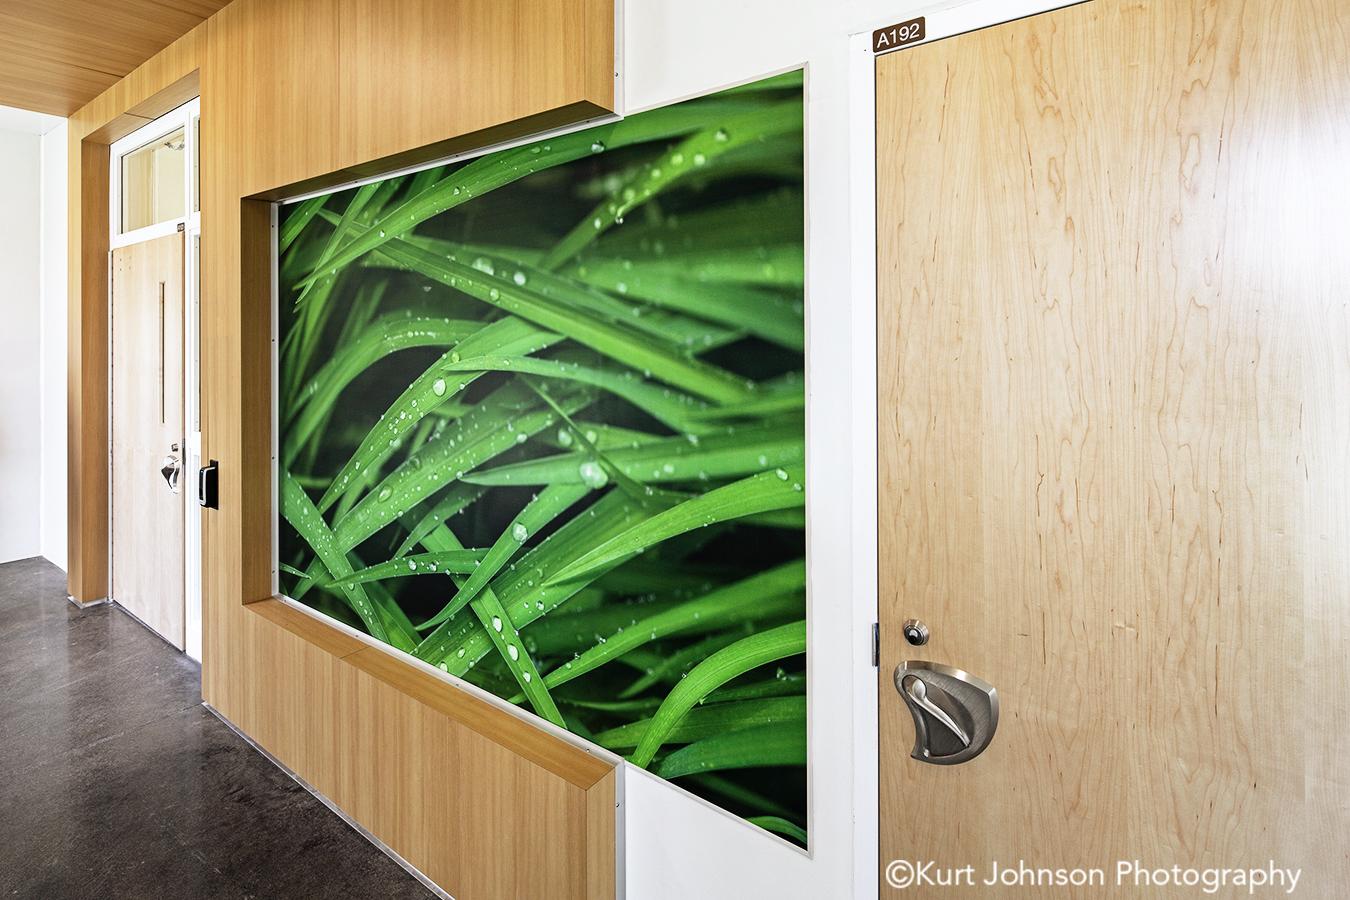 fulton state hospital missouri mo behavioral health Koroseal fusion wall protection green grass corridor hallway wayfinding art install installation grasses